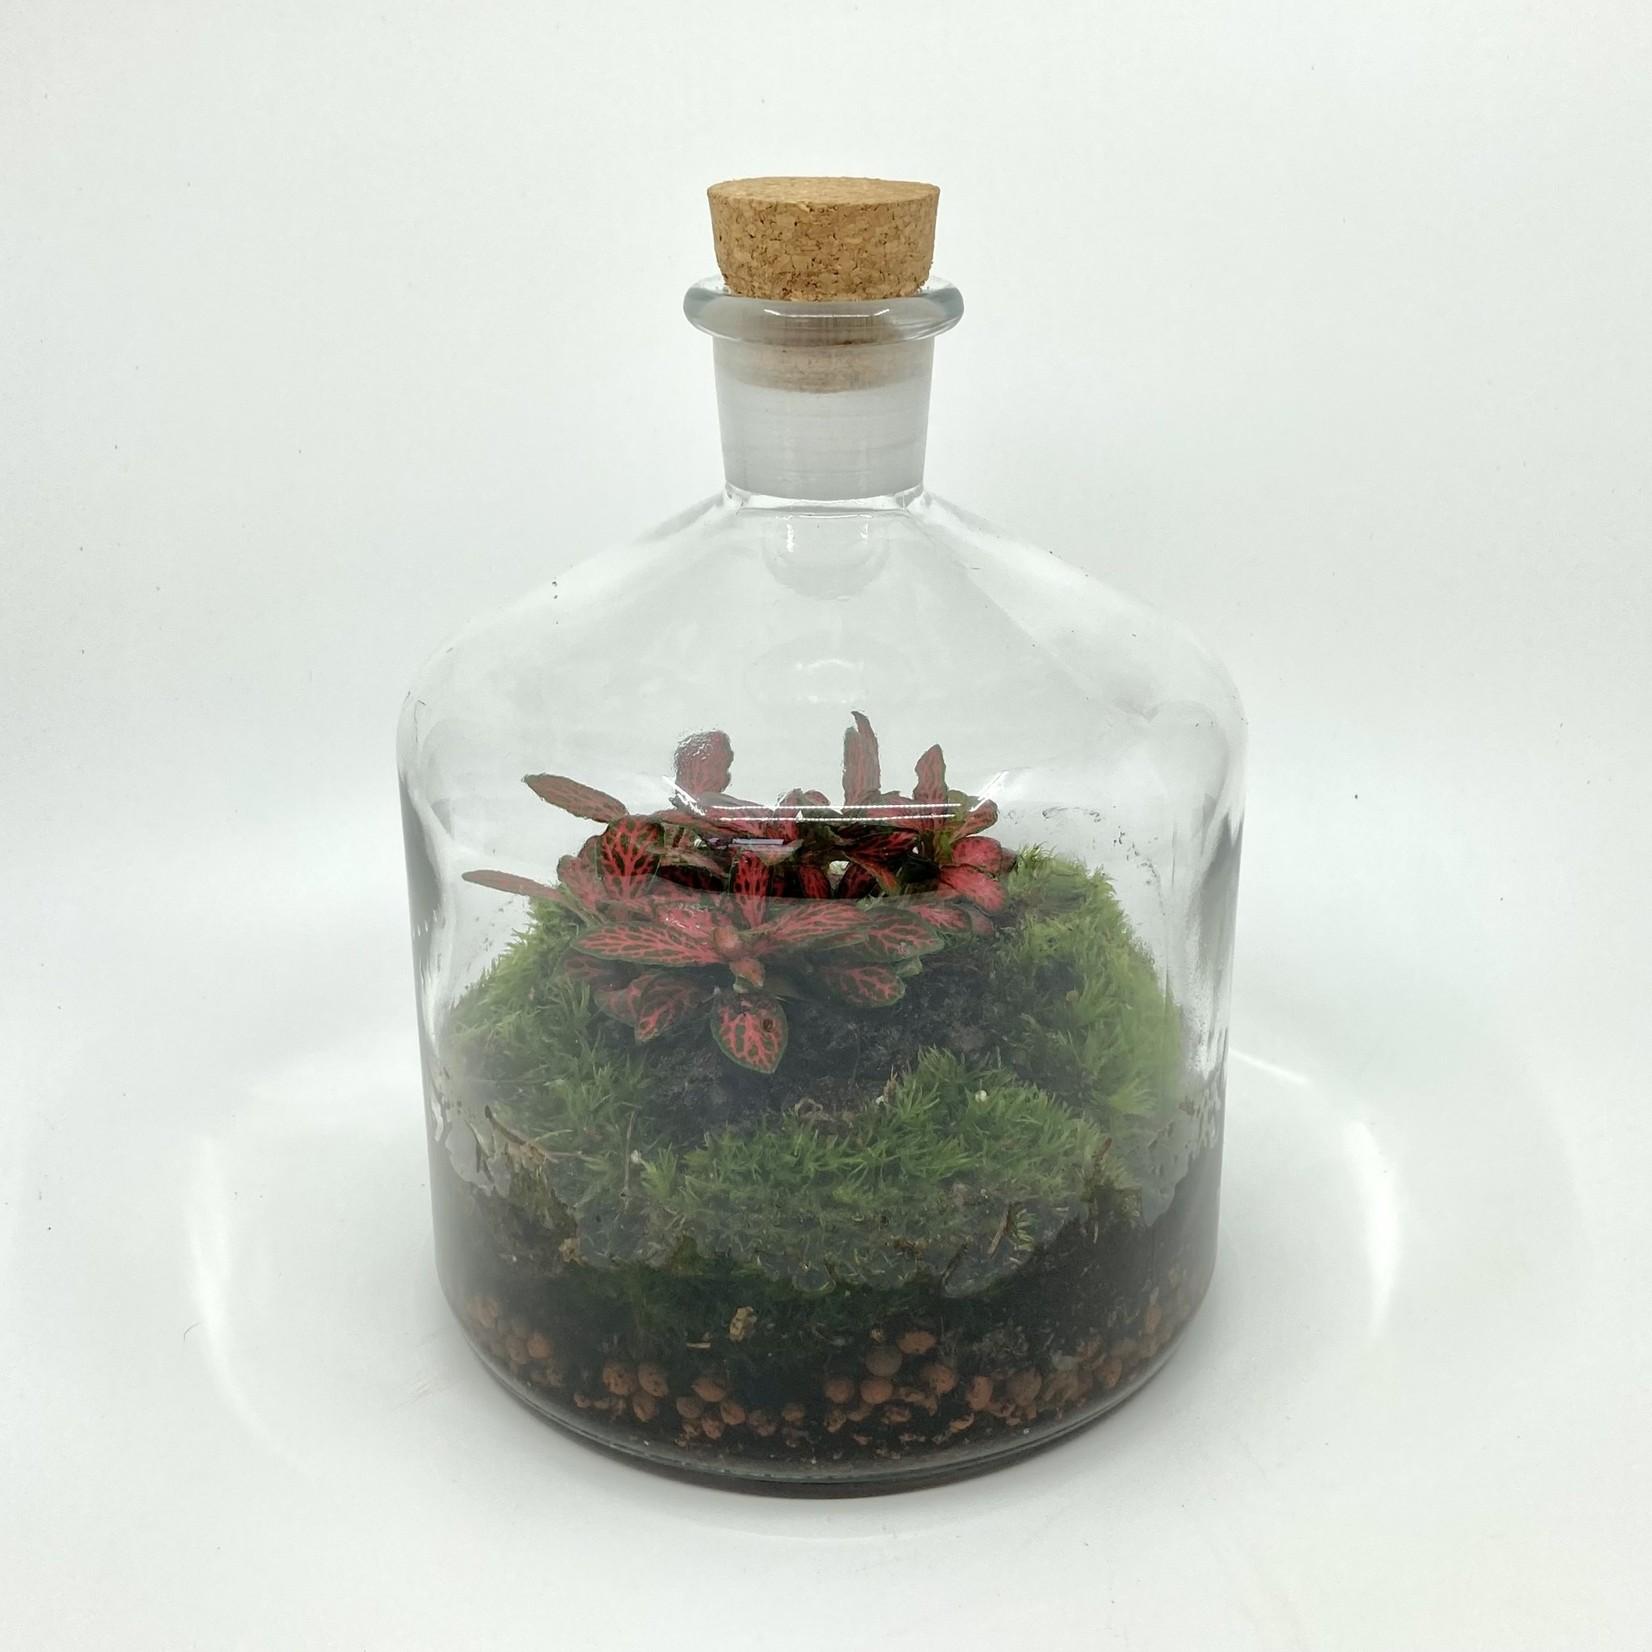 Spore Nursery Apothekersfles biosfeer, klein